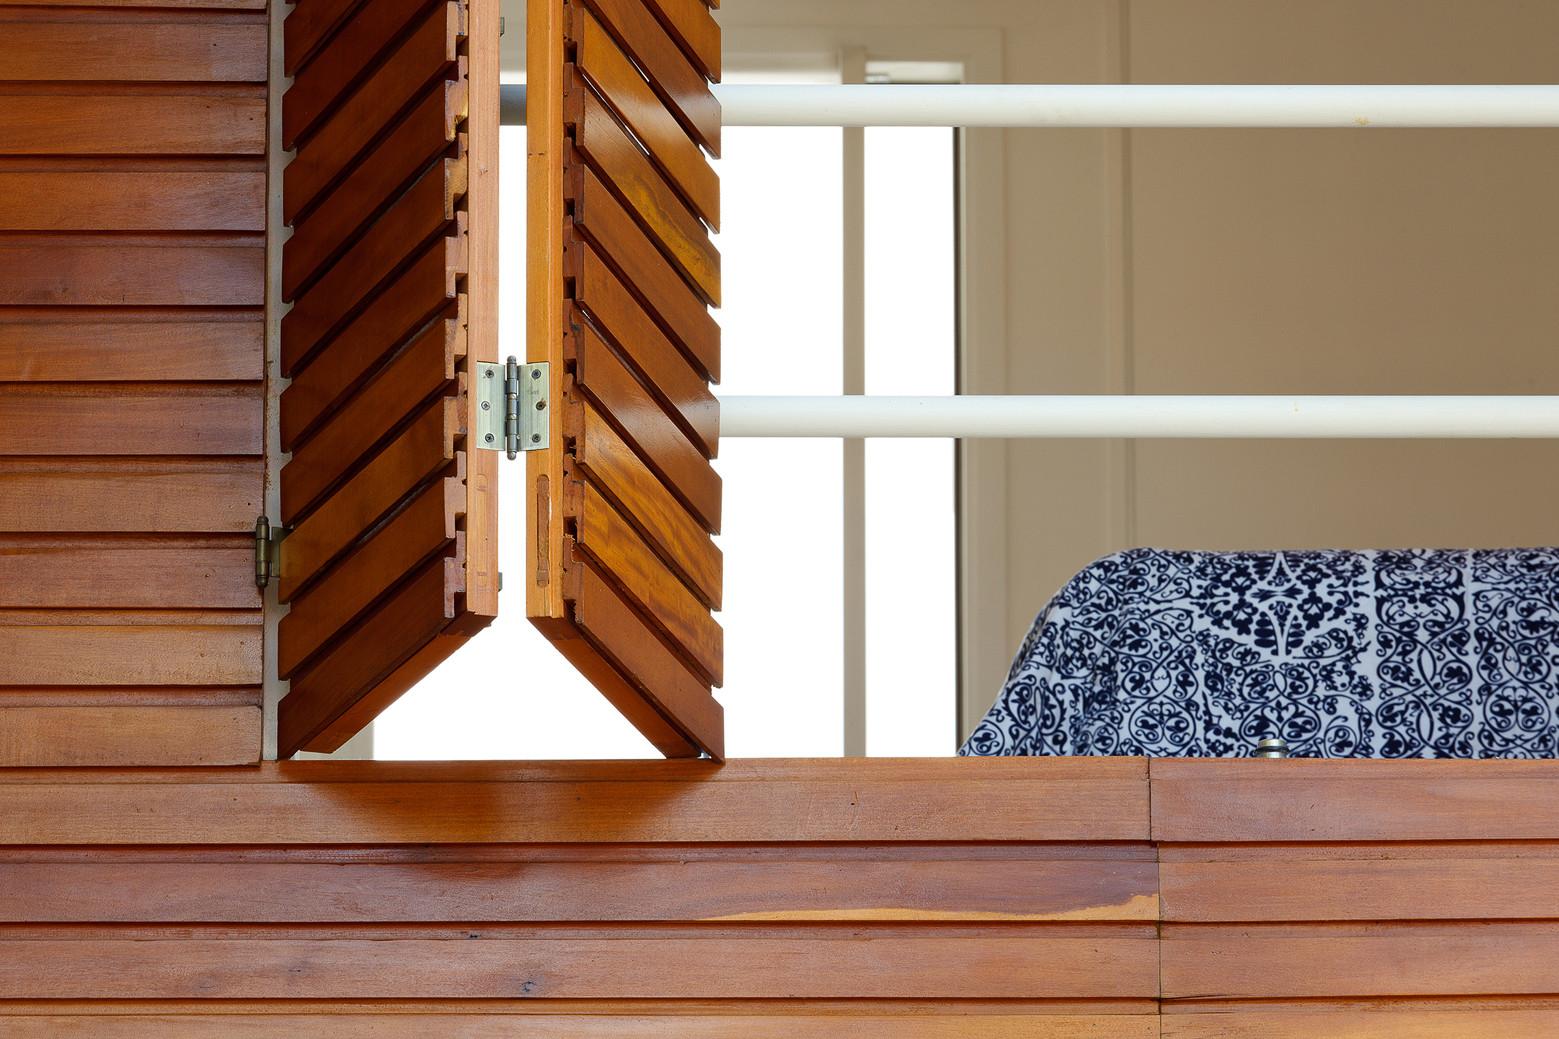 Gallery of brooklin house galeria arquitetos 5 - Maison brooklin sao paulo galeria arquitetos ...